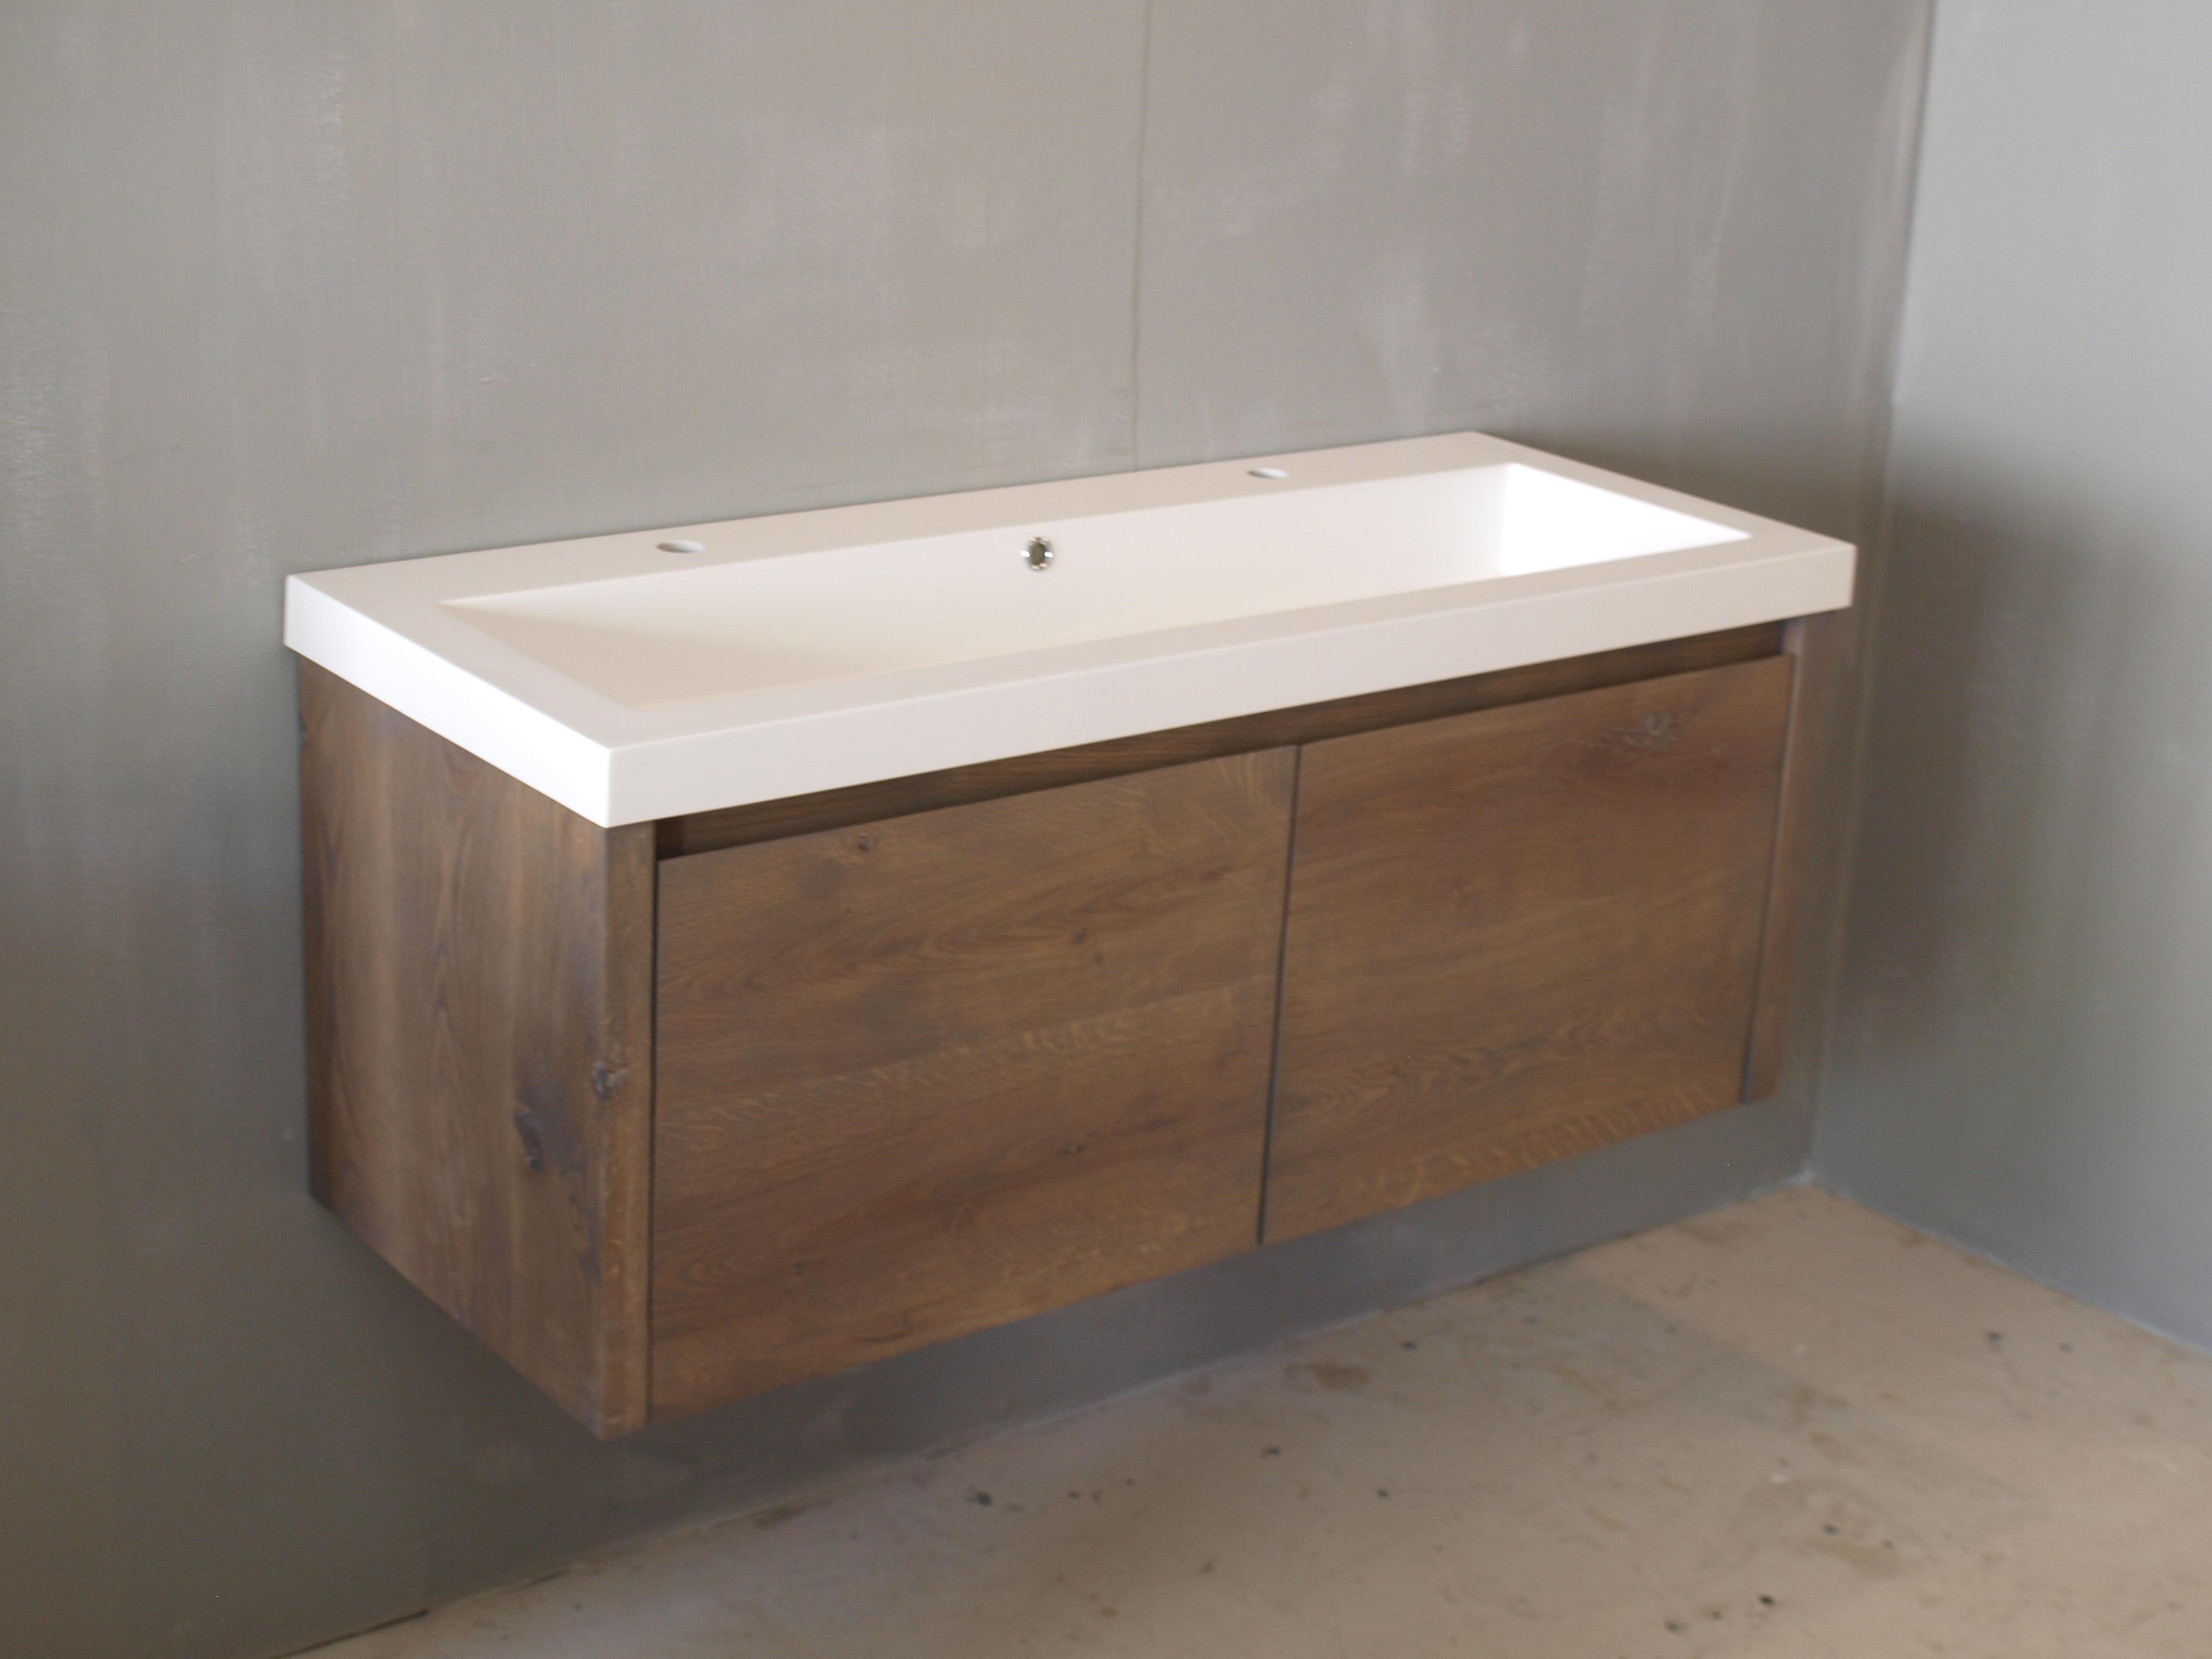 Badkamermeubel bella vita eiken 120 wood4 badkamermeubels accessoires - Moderne badkamer meubels ...